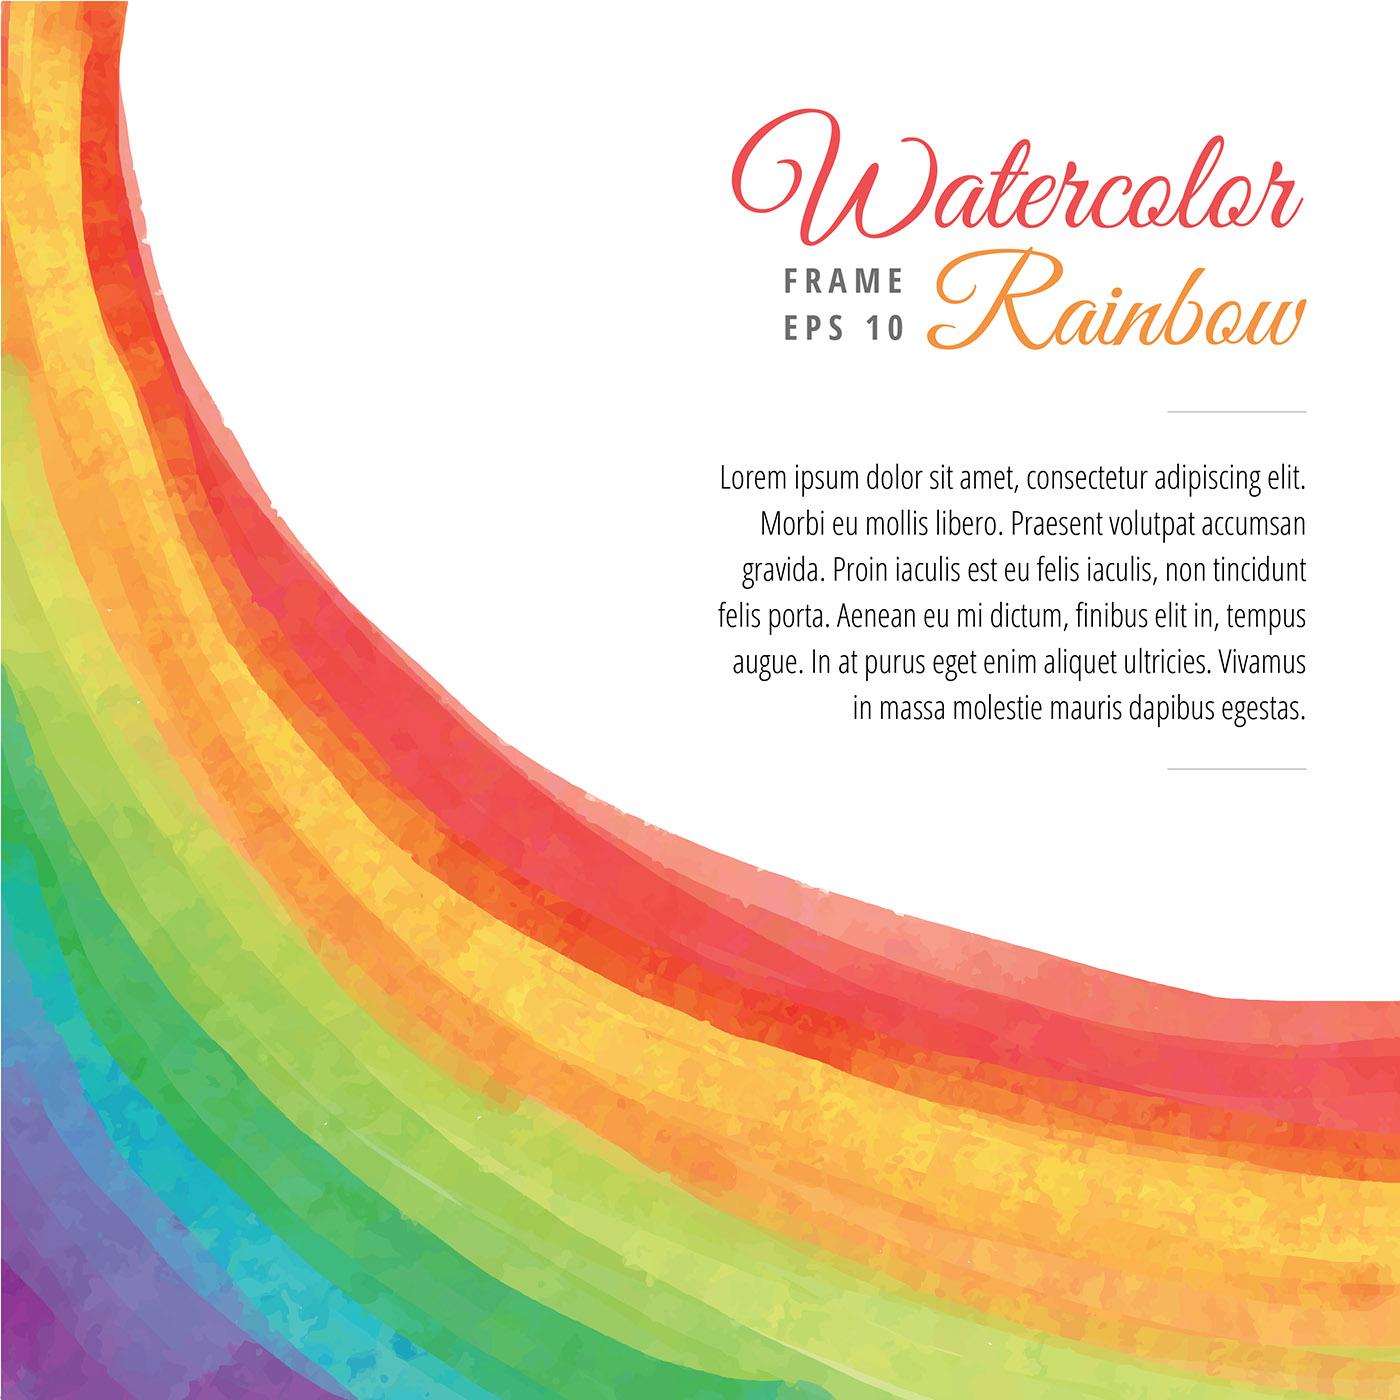 Rainbow Frame Free Vector Art - (6938 Free Downloads)